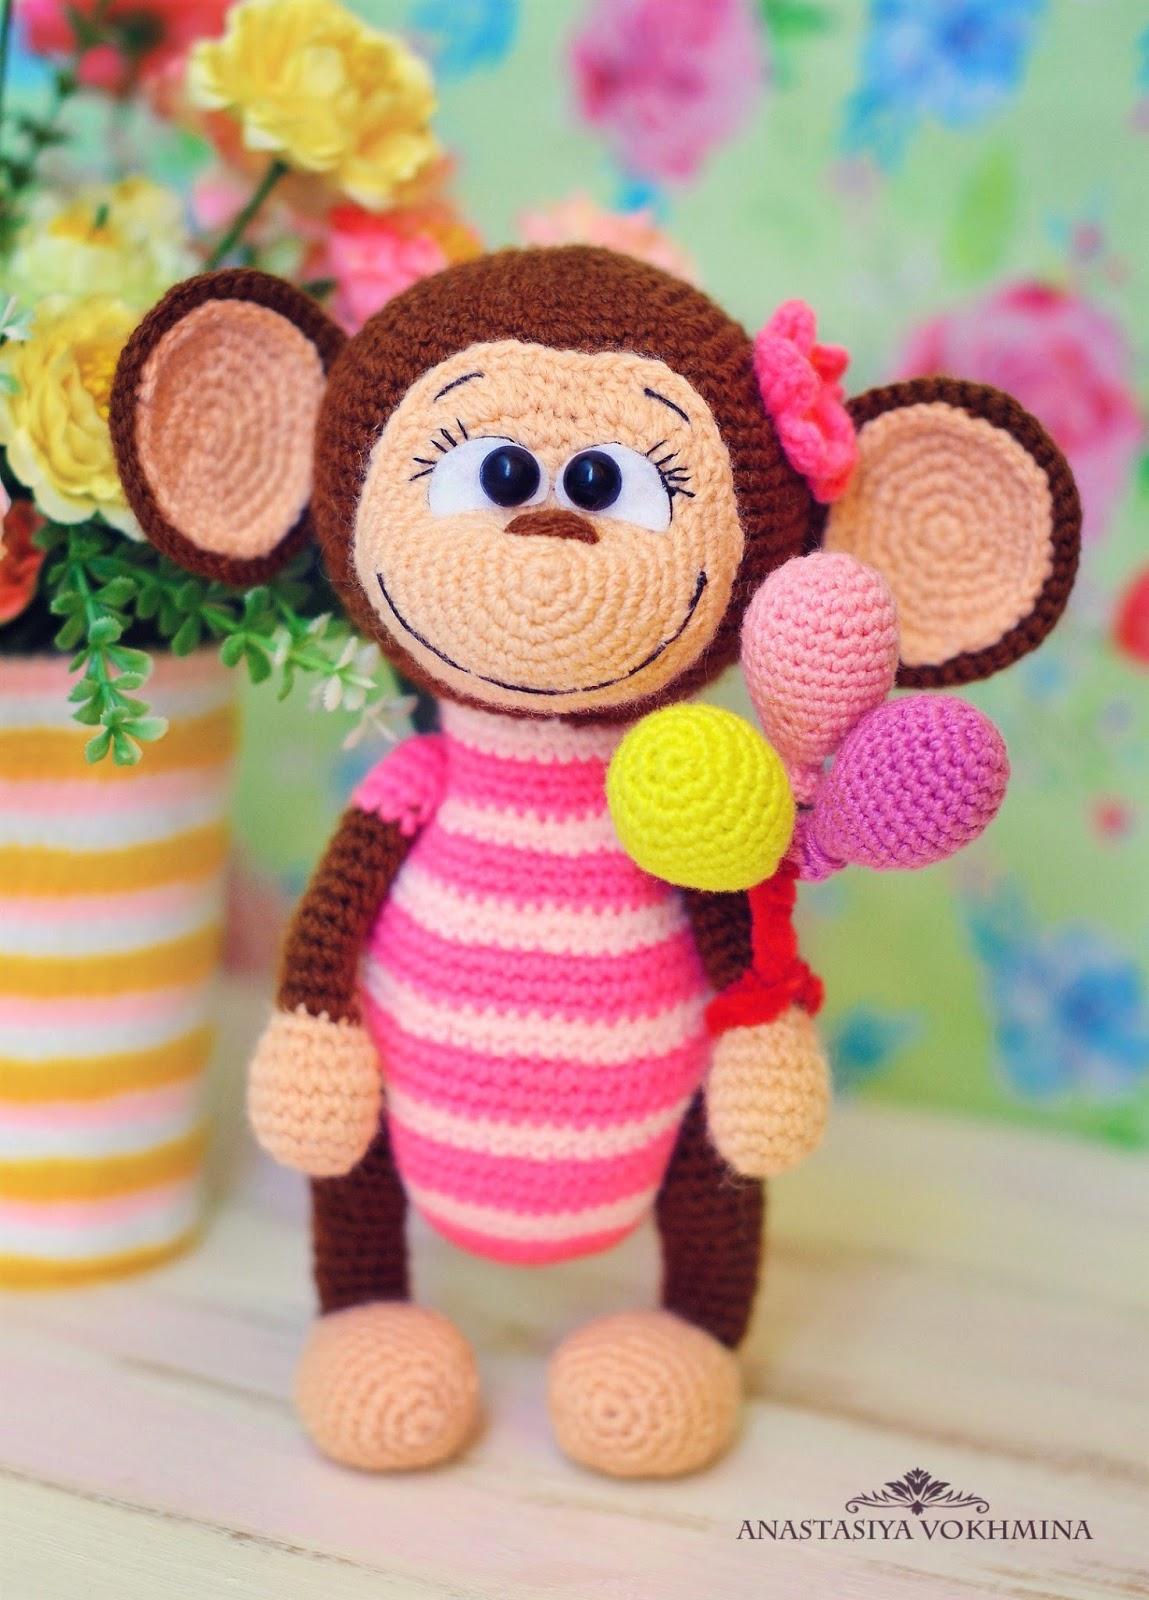 Cuddle Me Monkey amigurumi pattern - Amigurumi Today   1600x1149